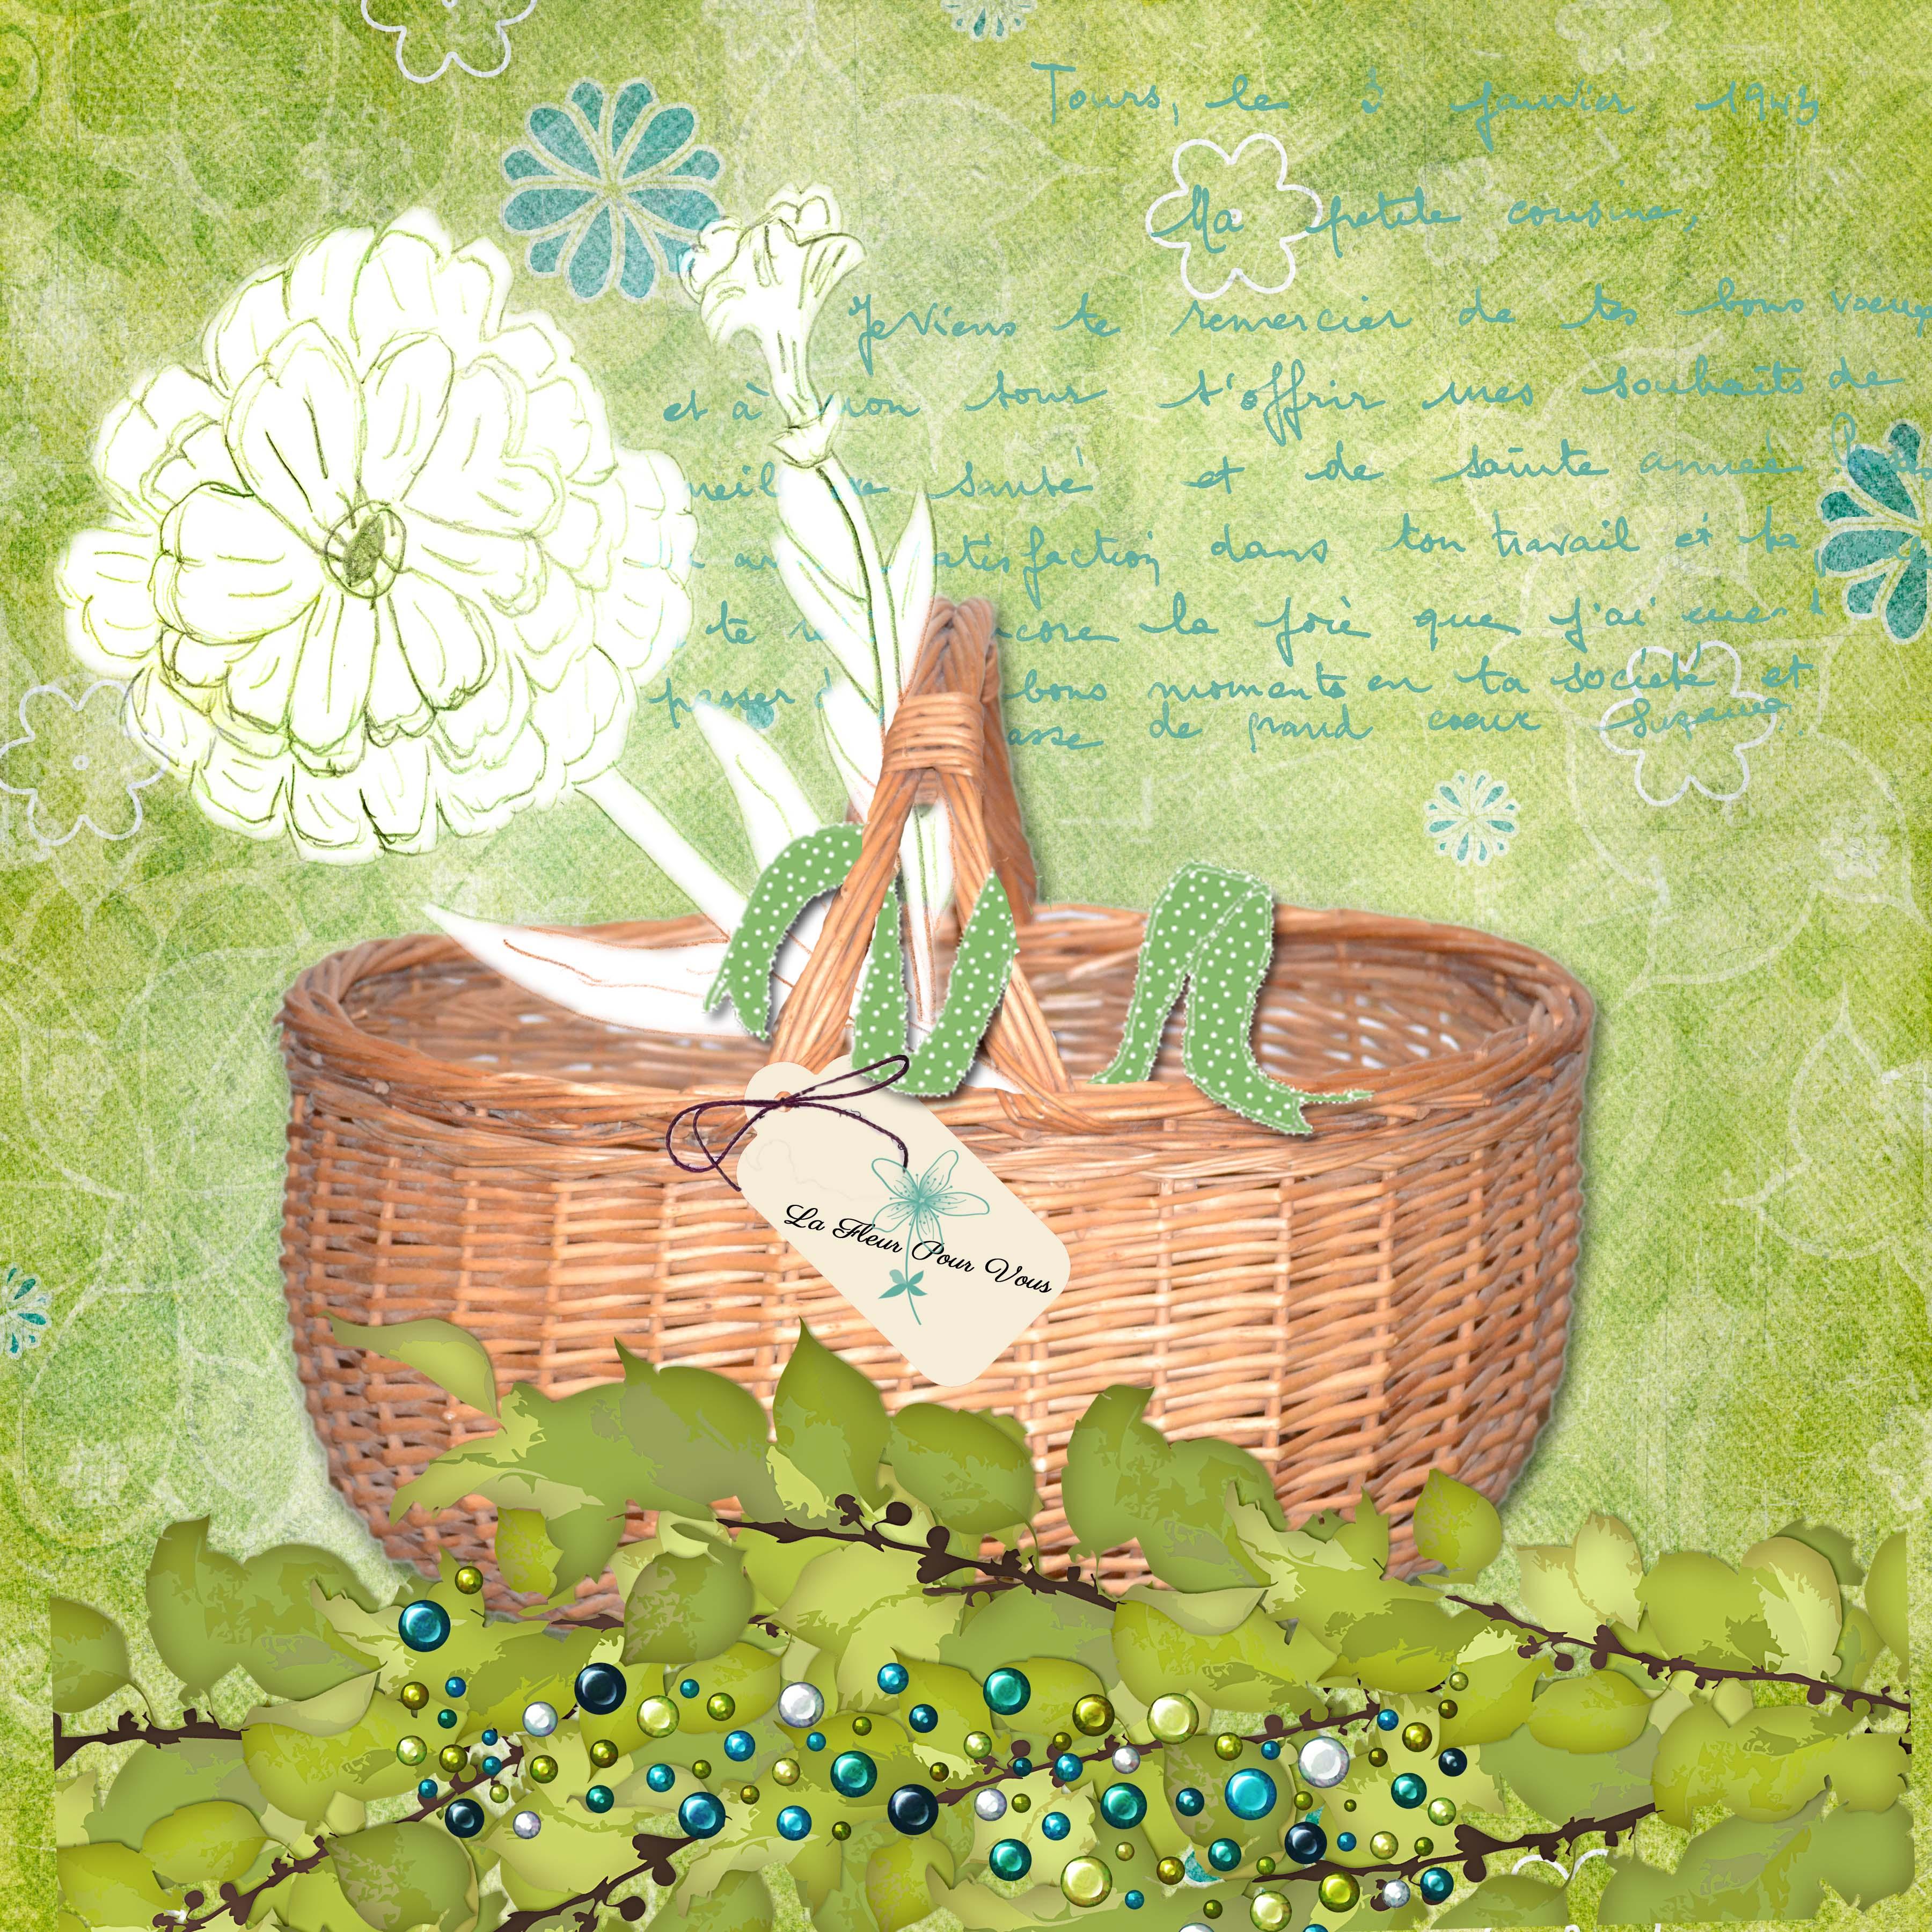 Flower in a basket scrabook page